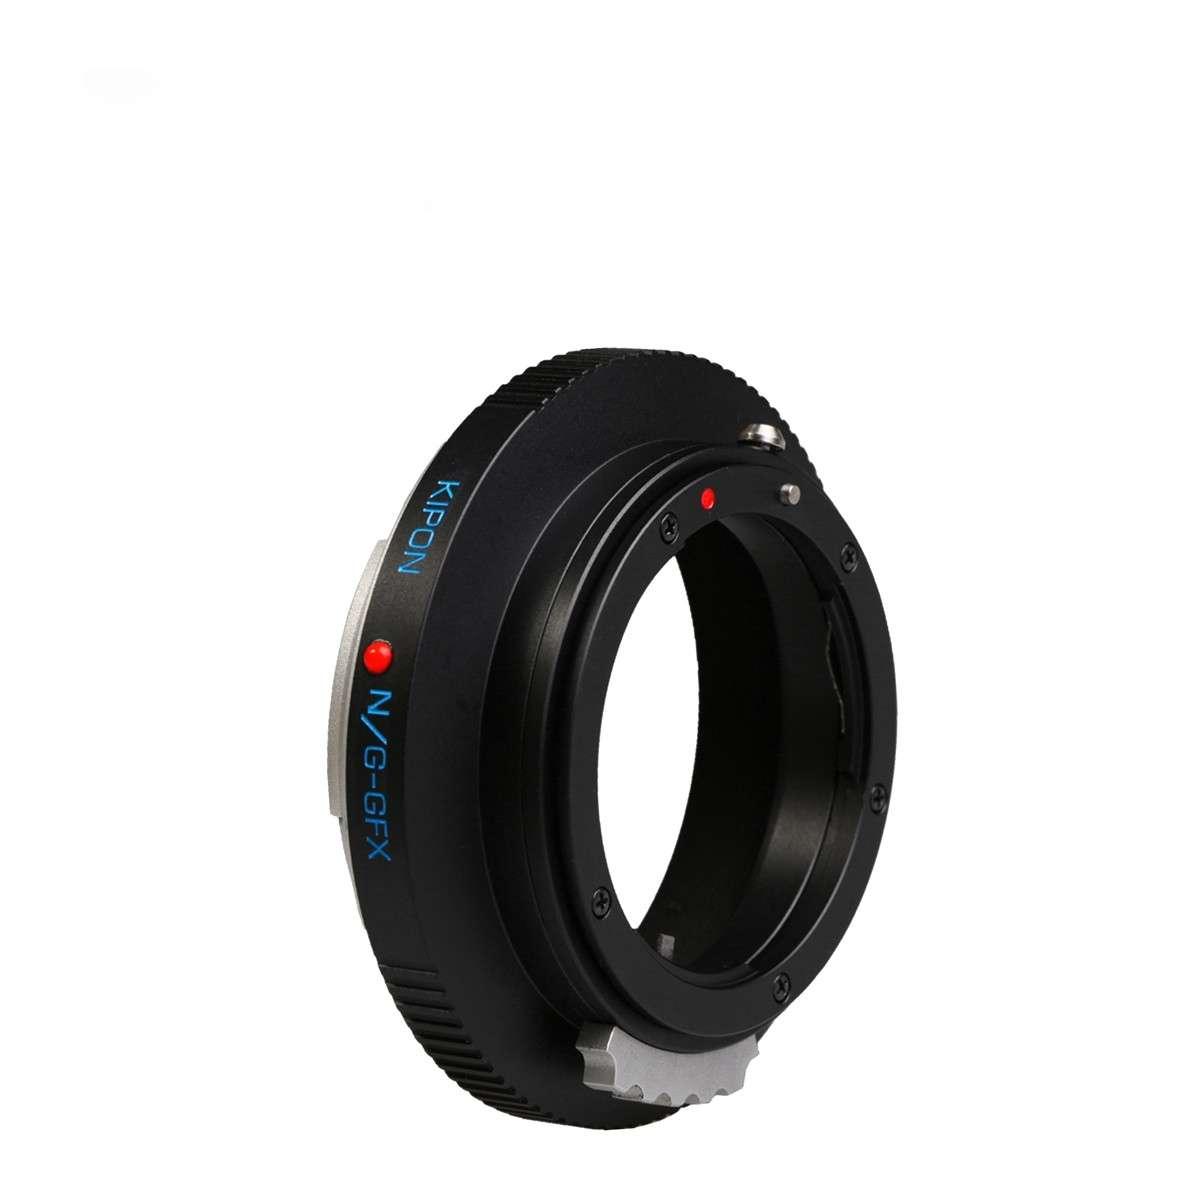 Kipon Adapter Fr Nikon G Auf Fuji Gfx Foto Walser Mamiya 645 Mount Lens To Medium Format Camera